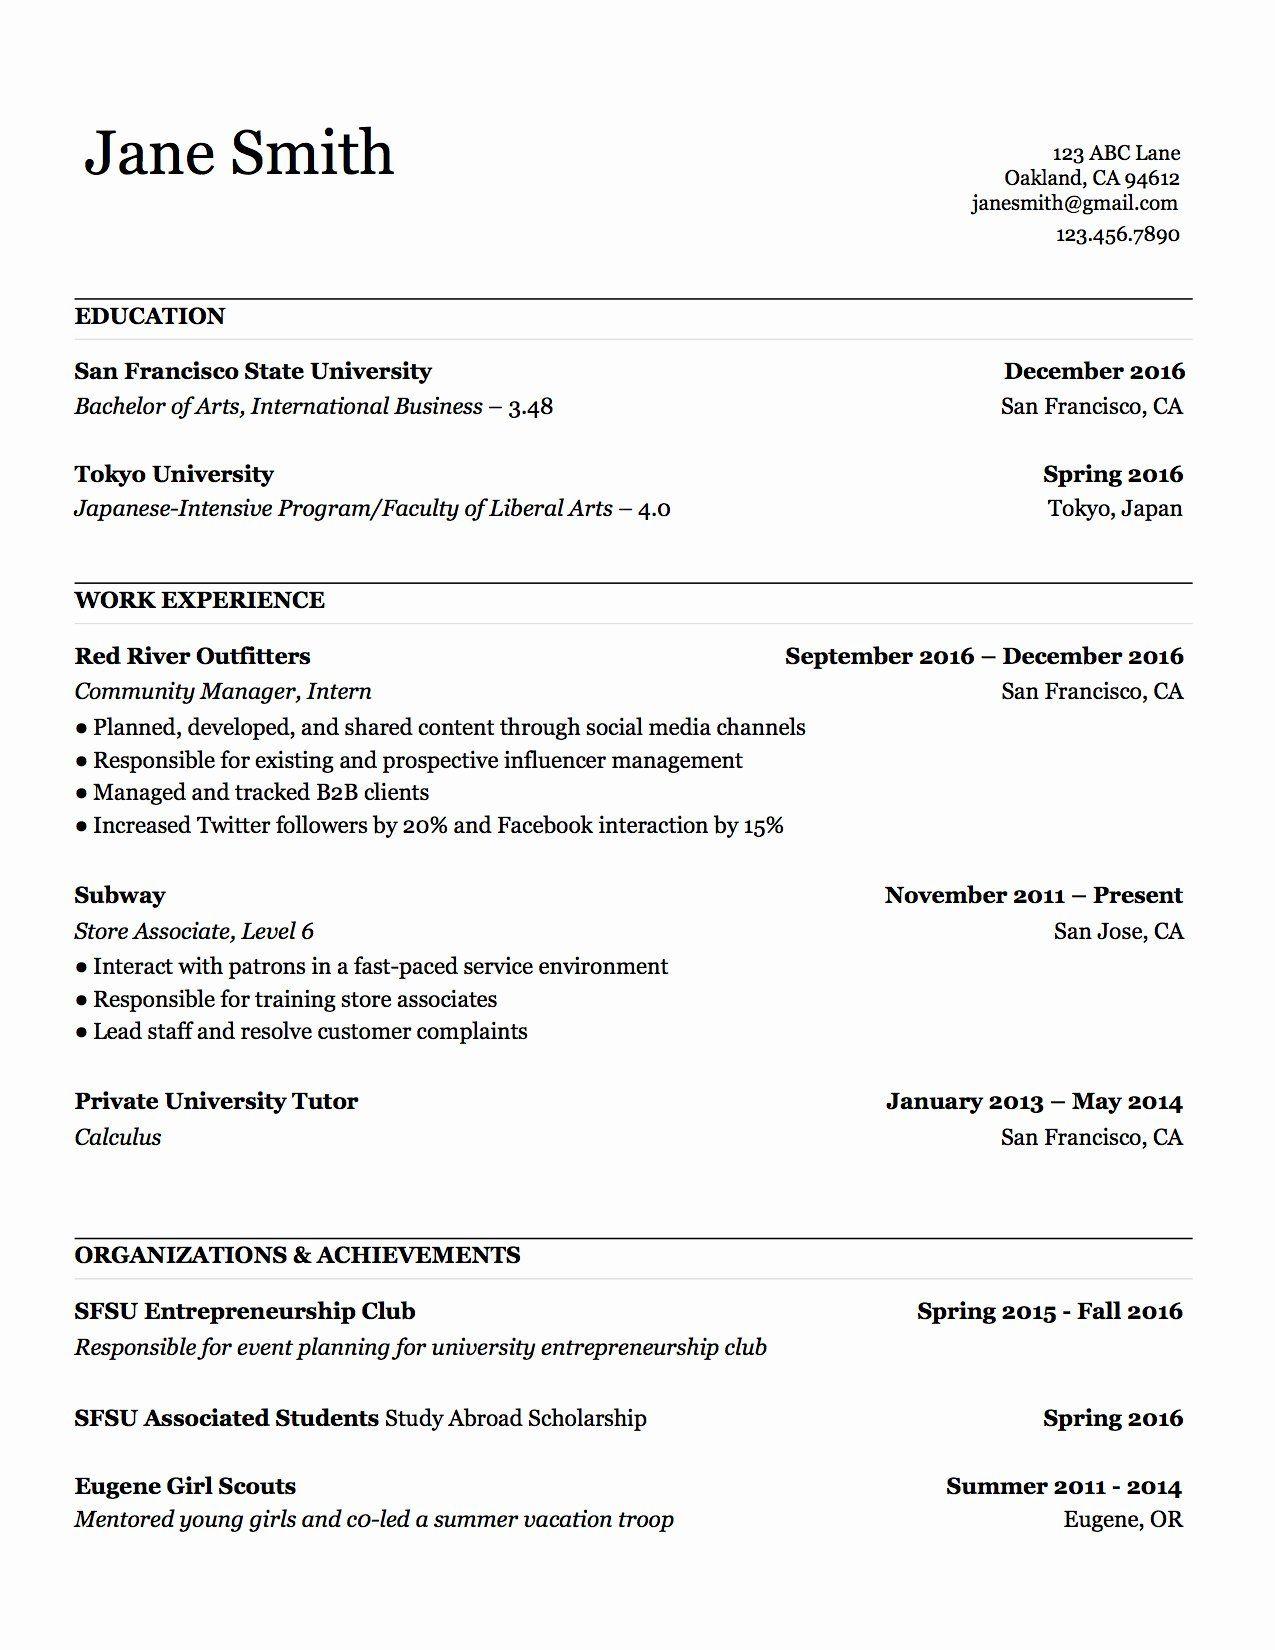 25 Free Printable Resume Templates in 2020 Free